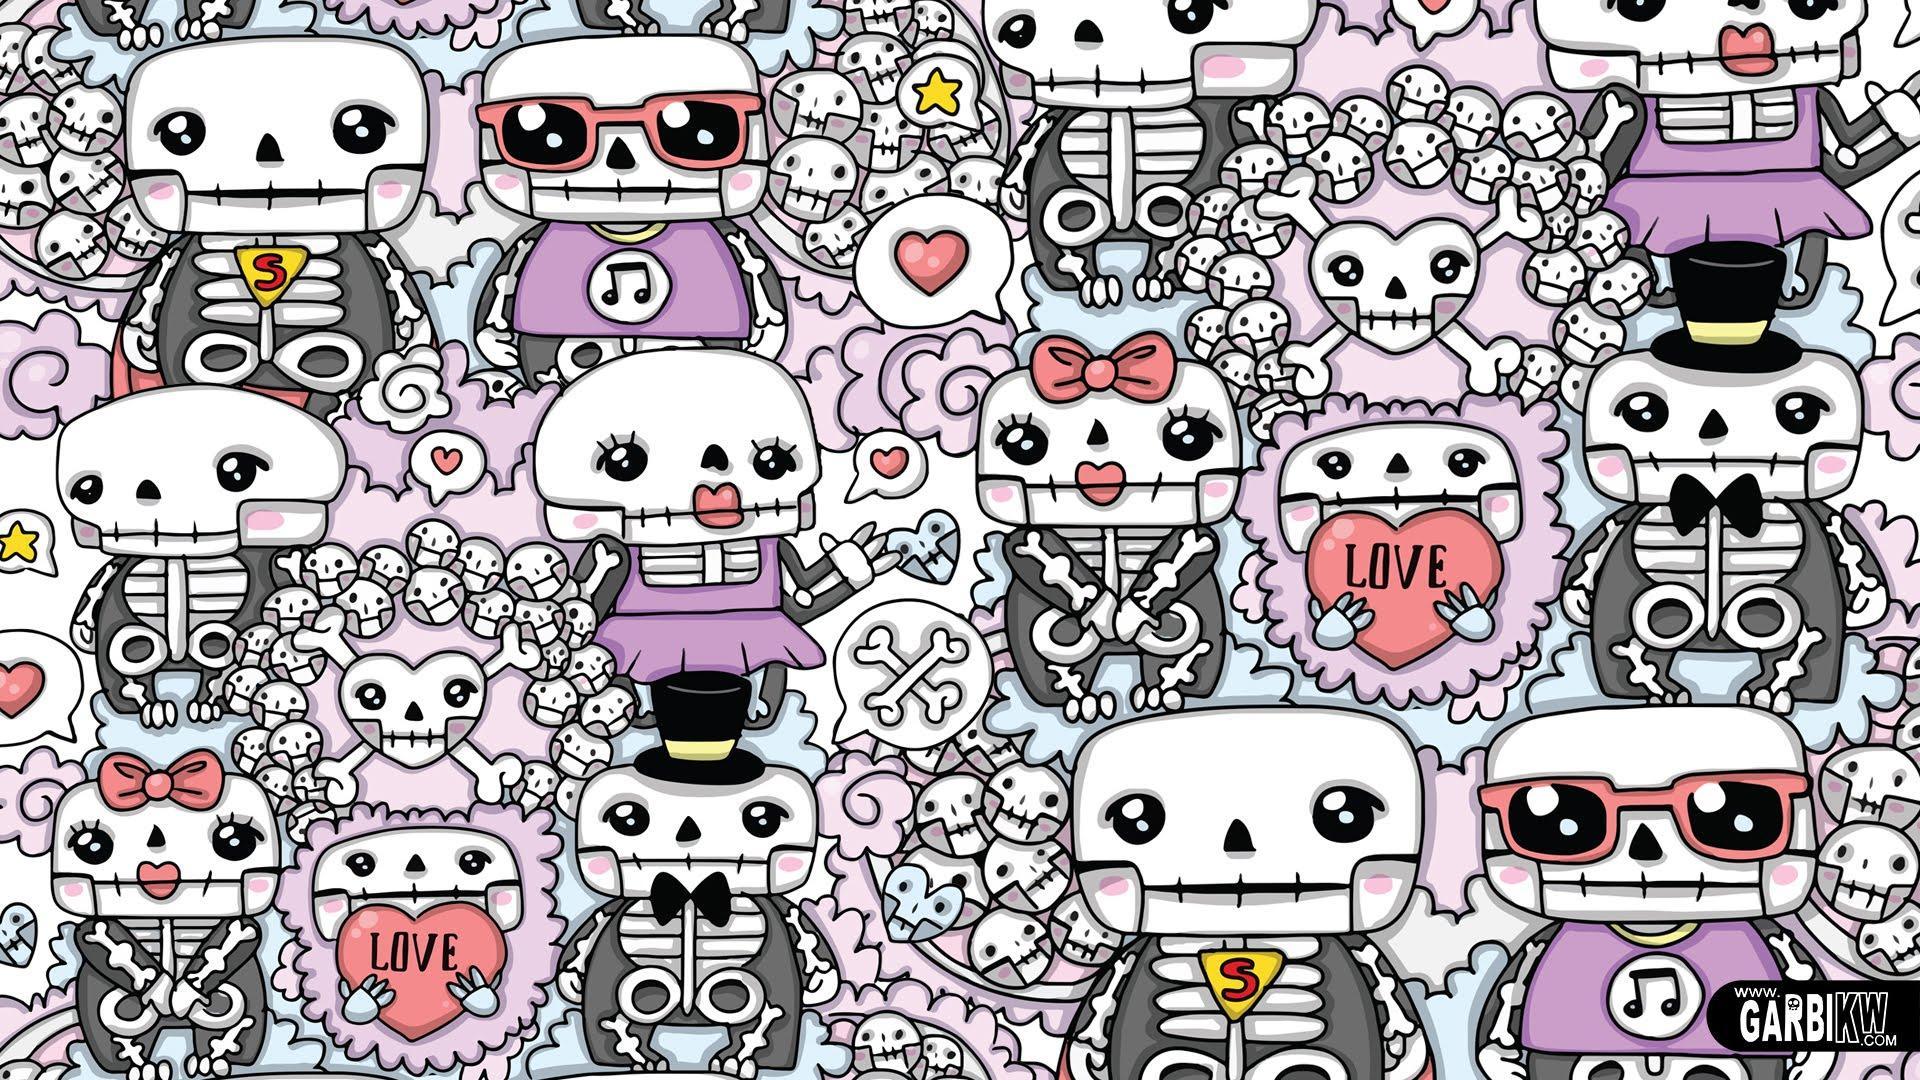 kawaii cute doodle doodles graffiti wallpapers skeletons monster kw backgrounds garbi wallpaperaccess